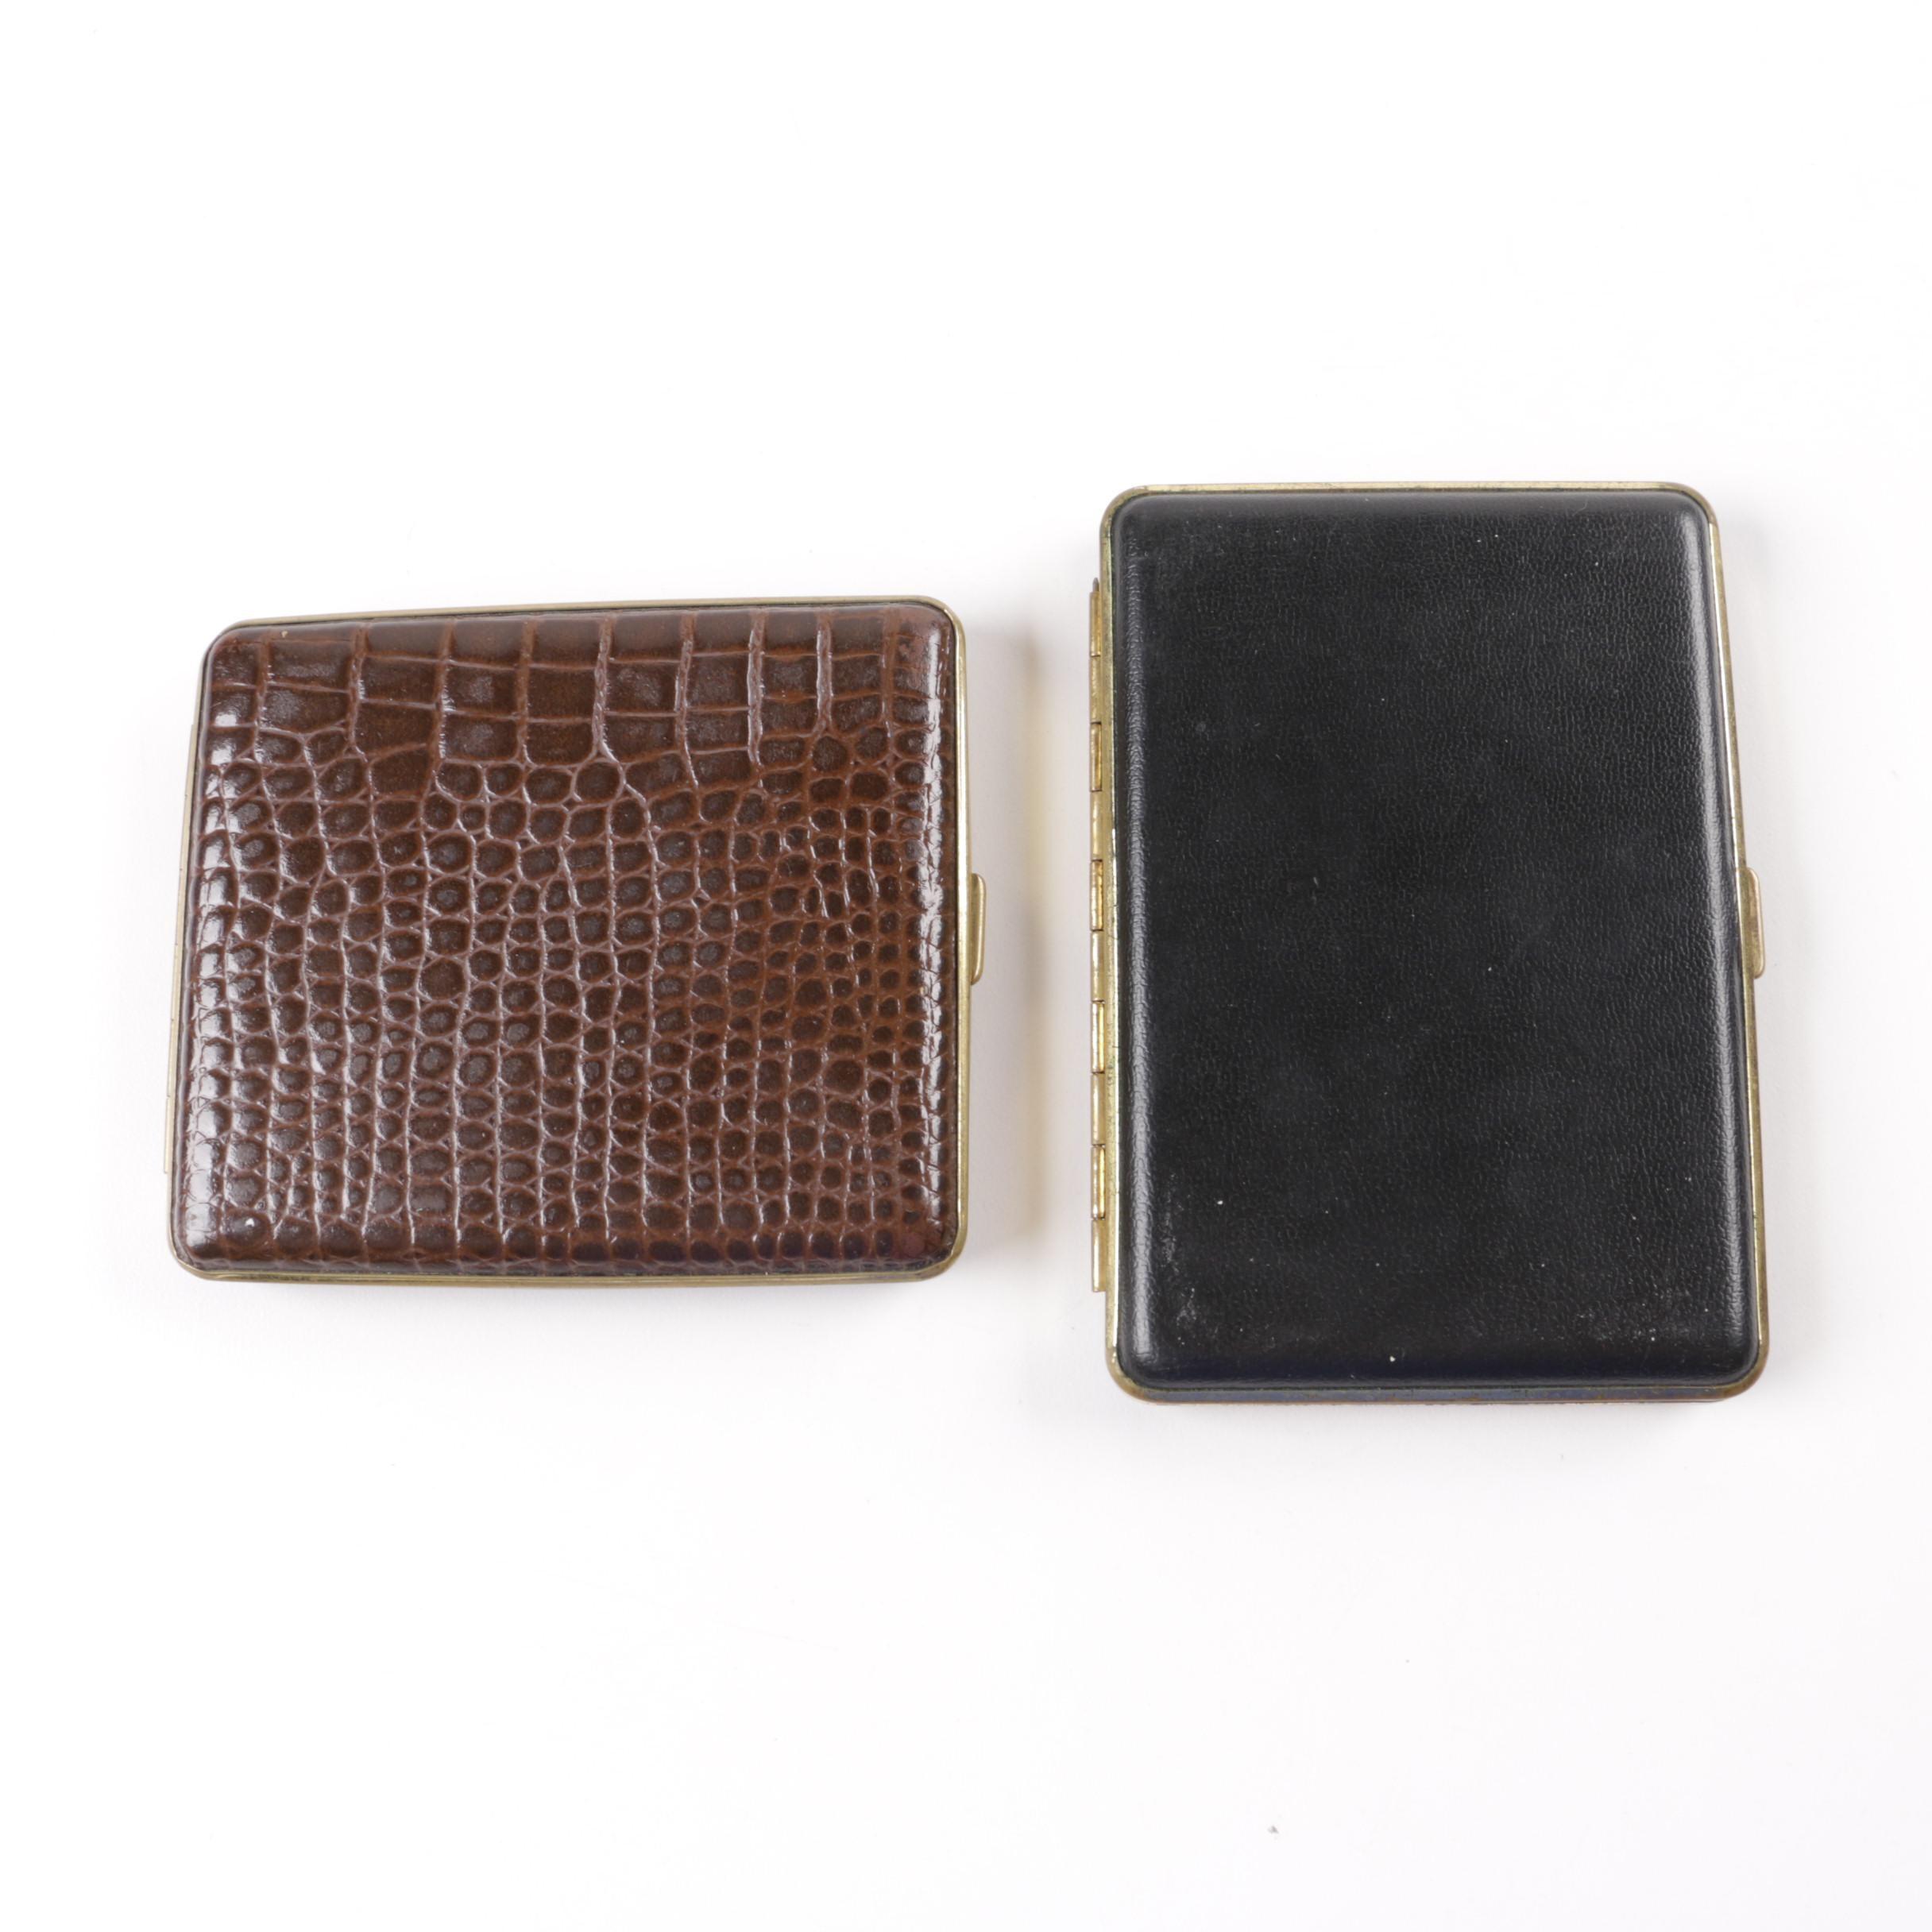 Vintage Leather Bound Cigarette Cases